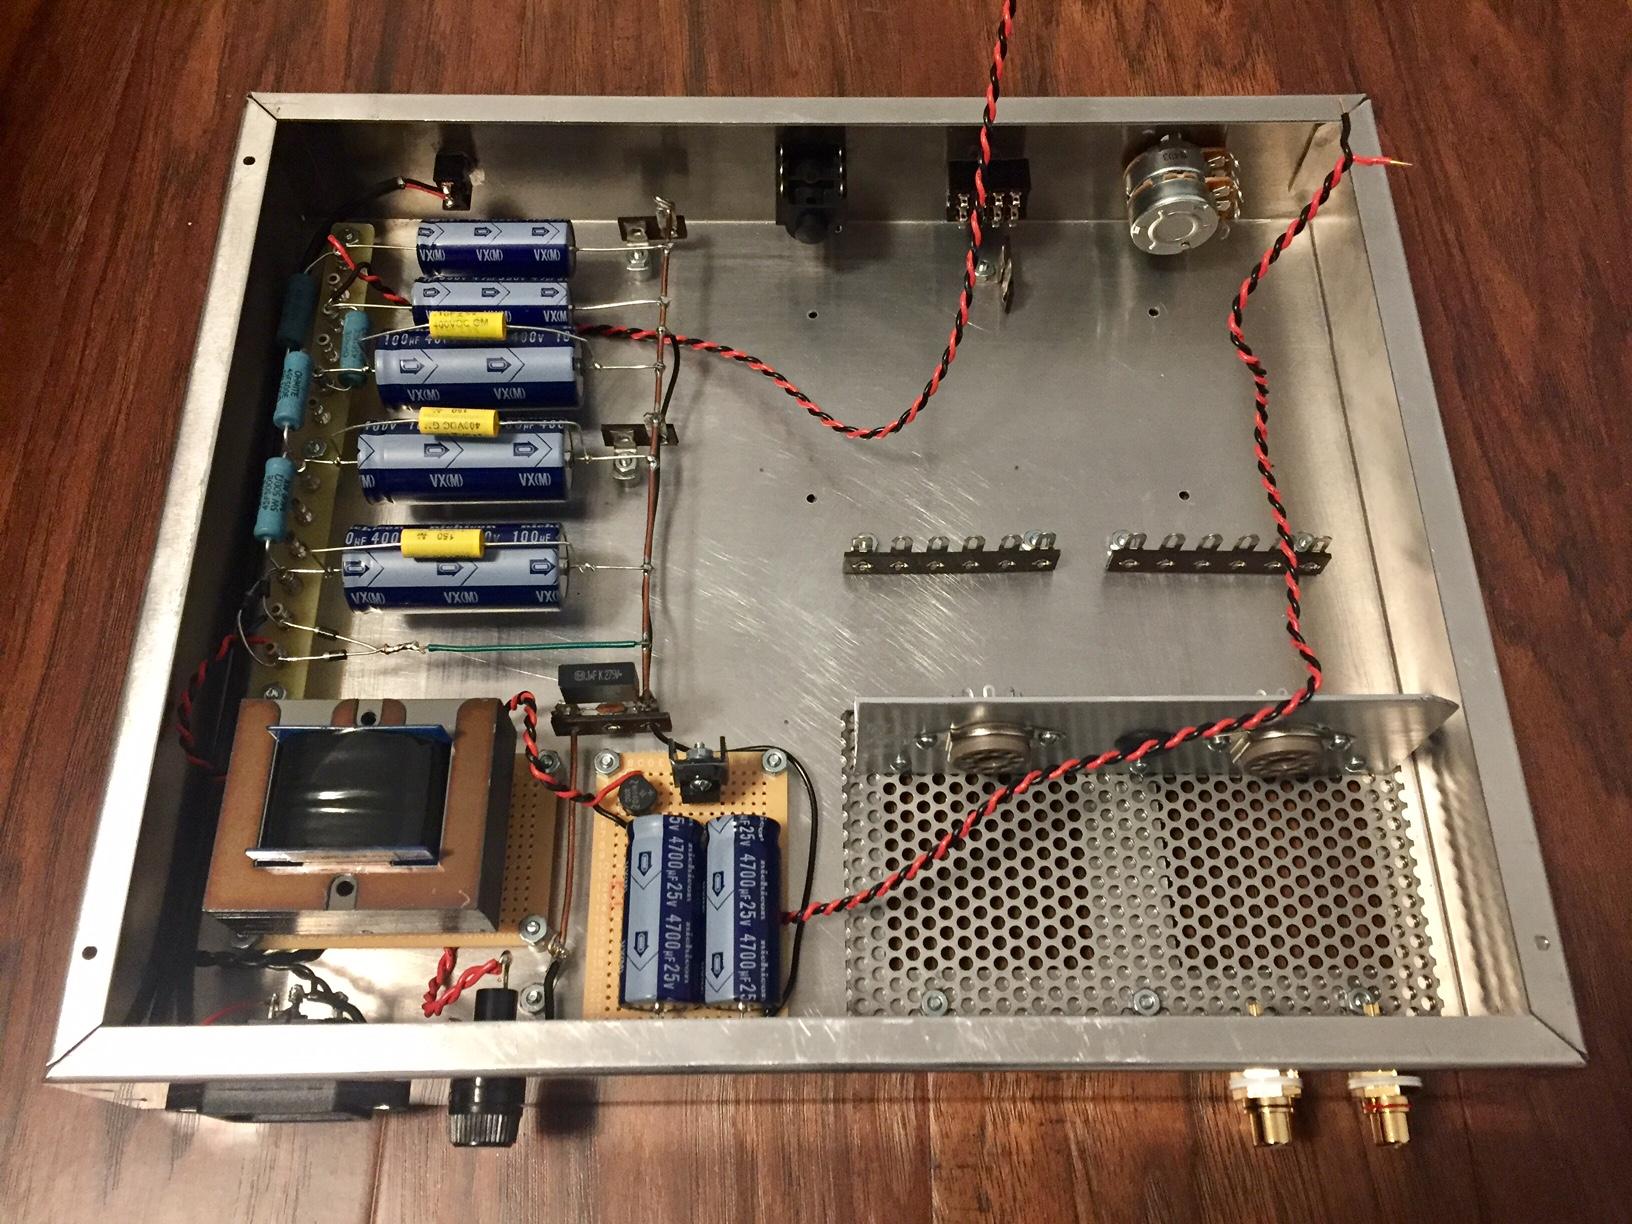 Bruce Heran 6DJ8 Headwatt Amp Build | Headphone Reviews and